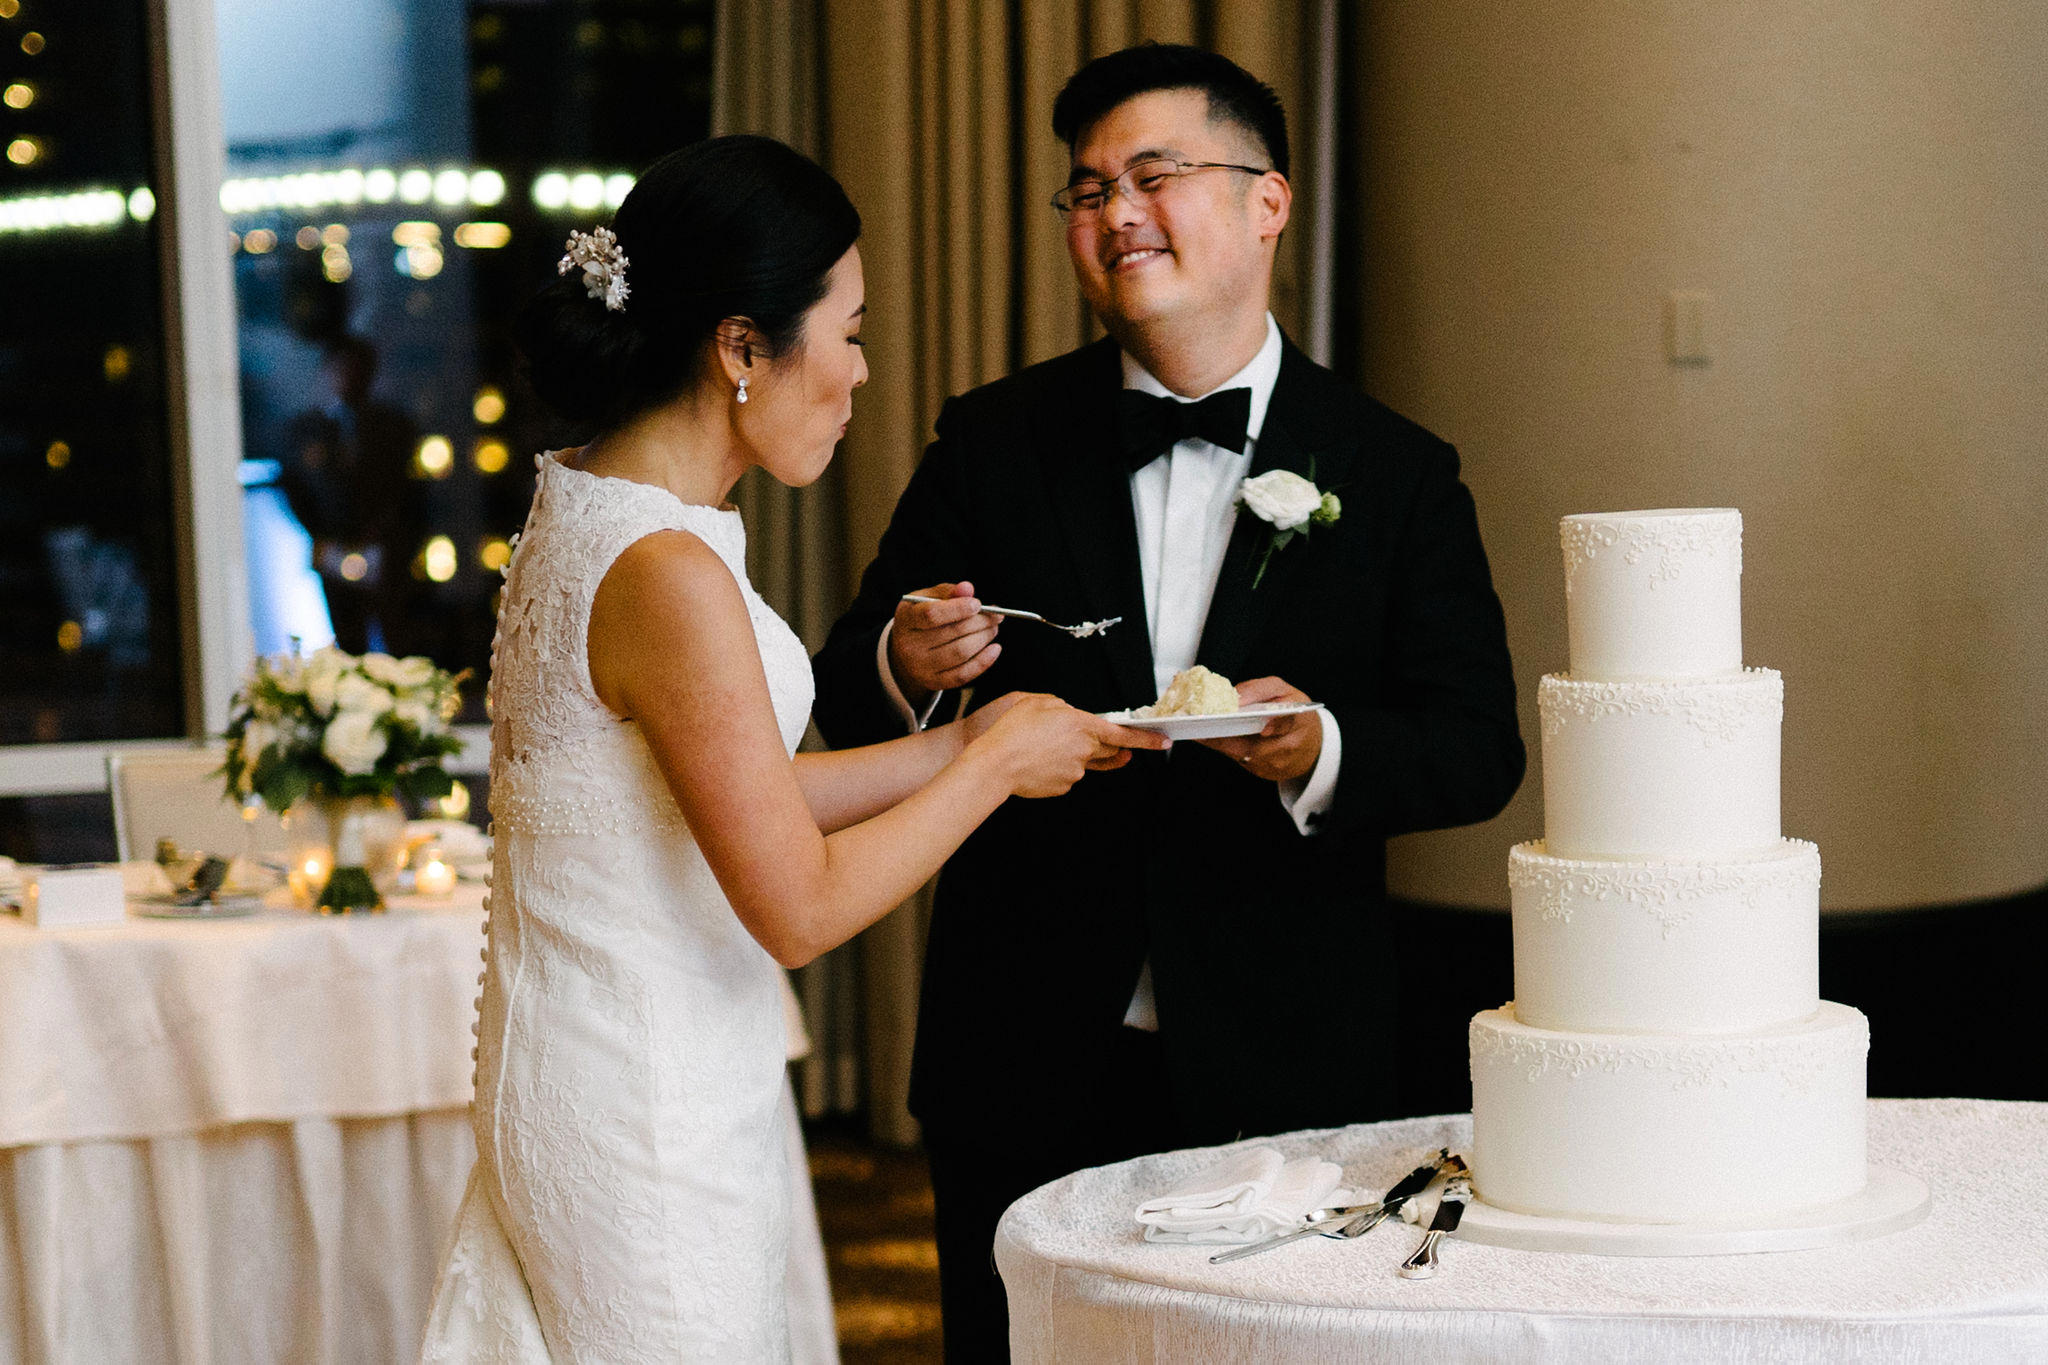 043-rempel-photography-chicago-wedding-inspiration-sara-philip-rockefeller-chapel-trump-tower.jpg